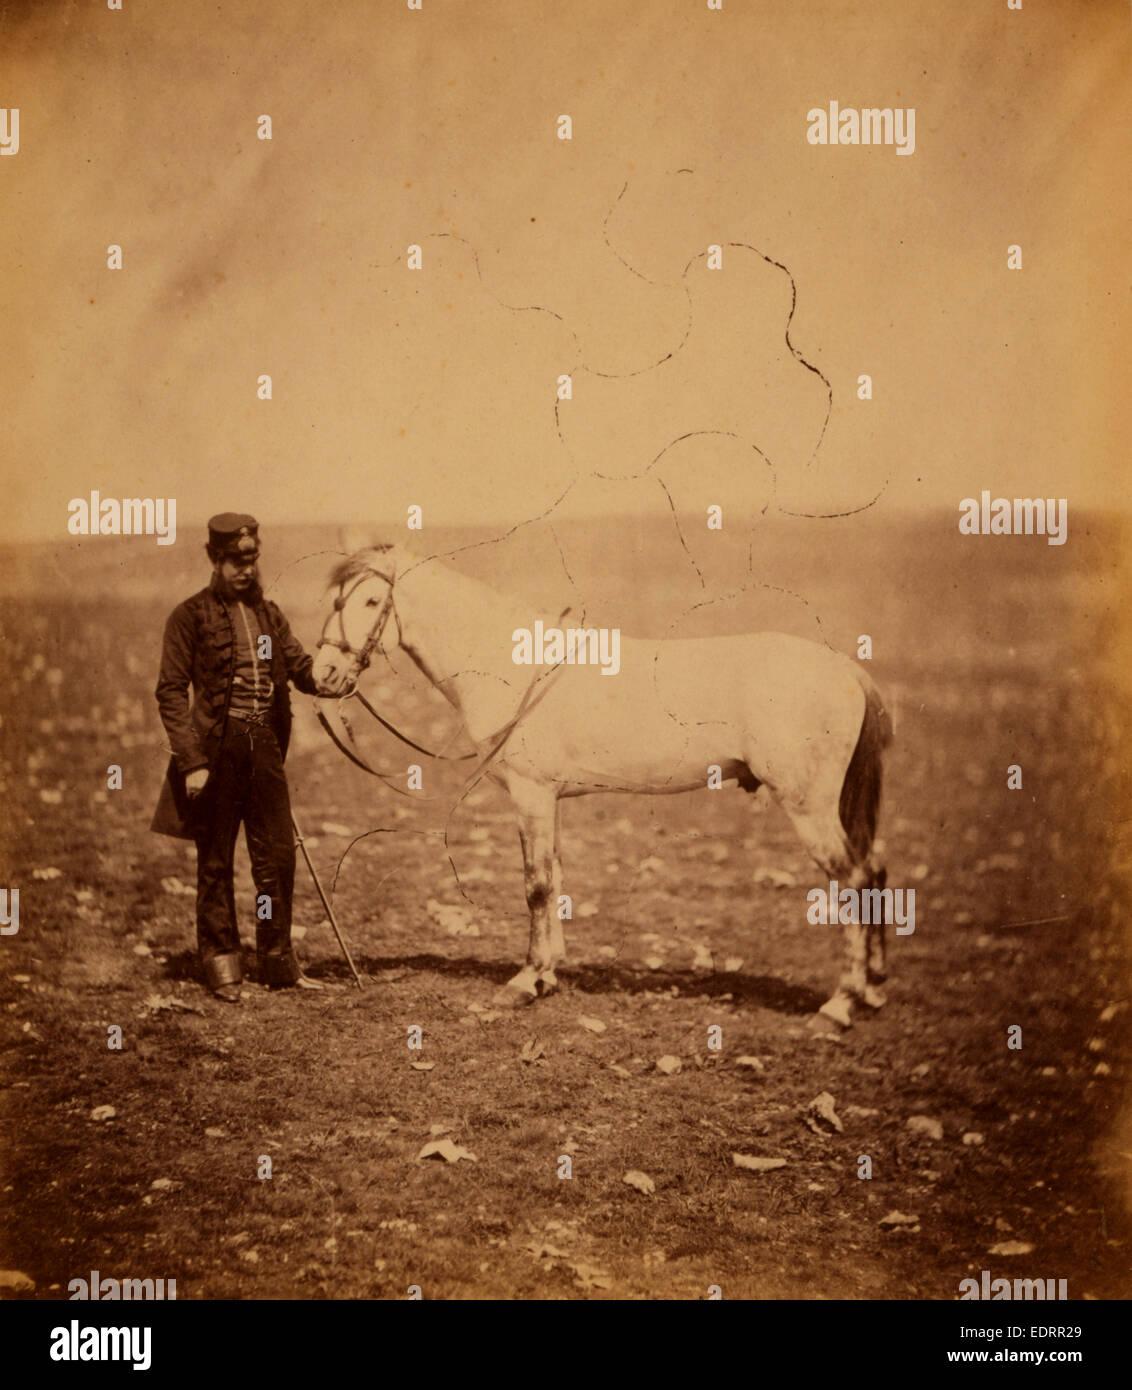 Captain Staunton [i.e., Stanton], Royal Engineers, Crimean War, 1853-1856, Roger Fenton - Stock Image